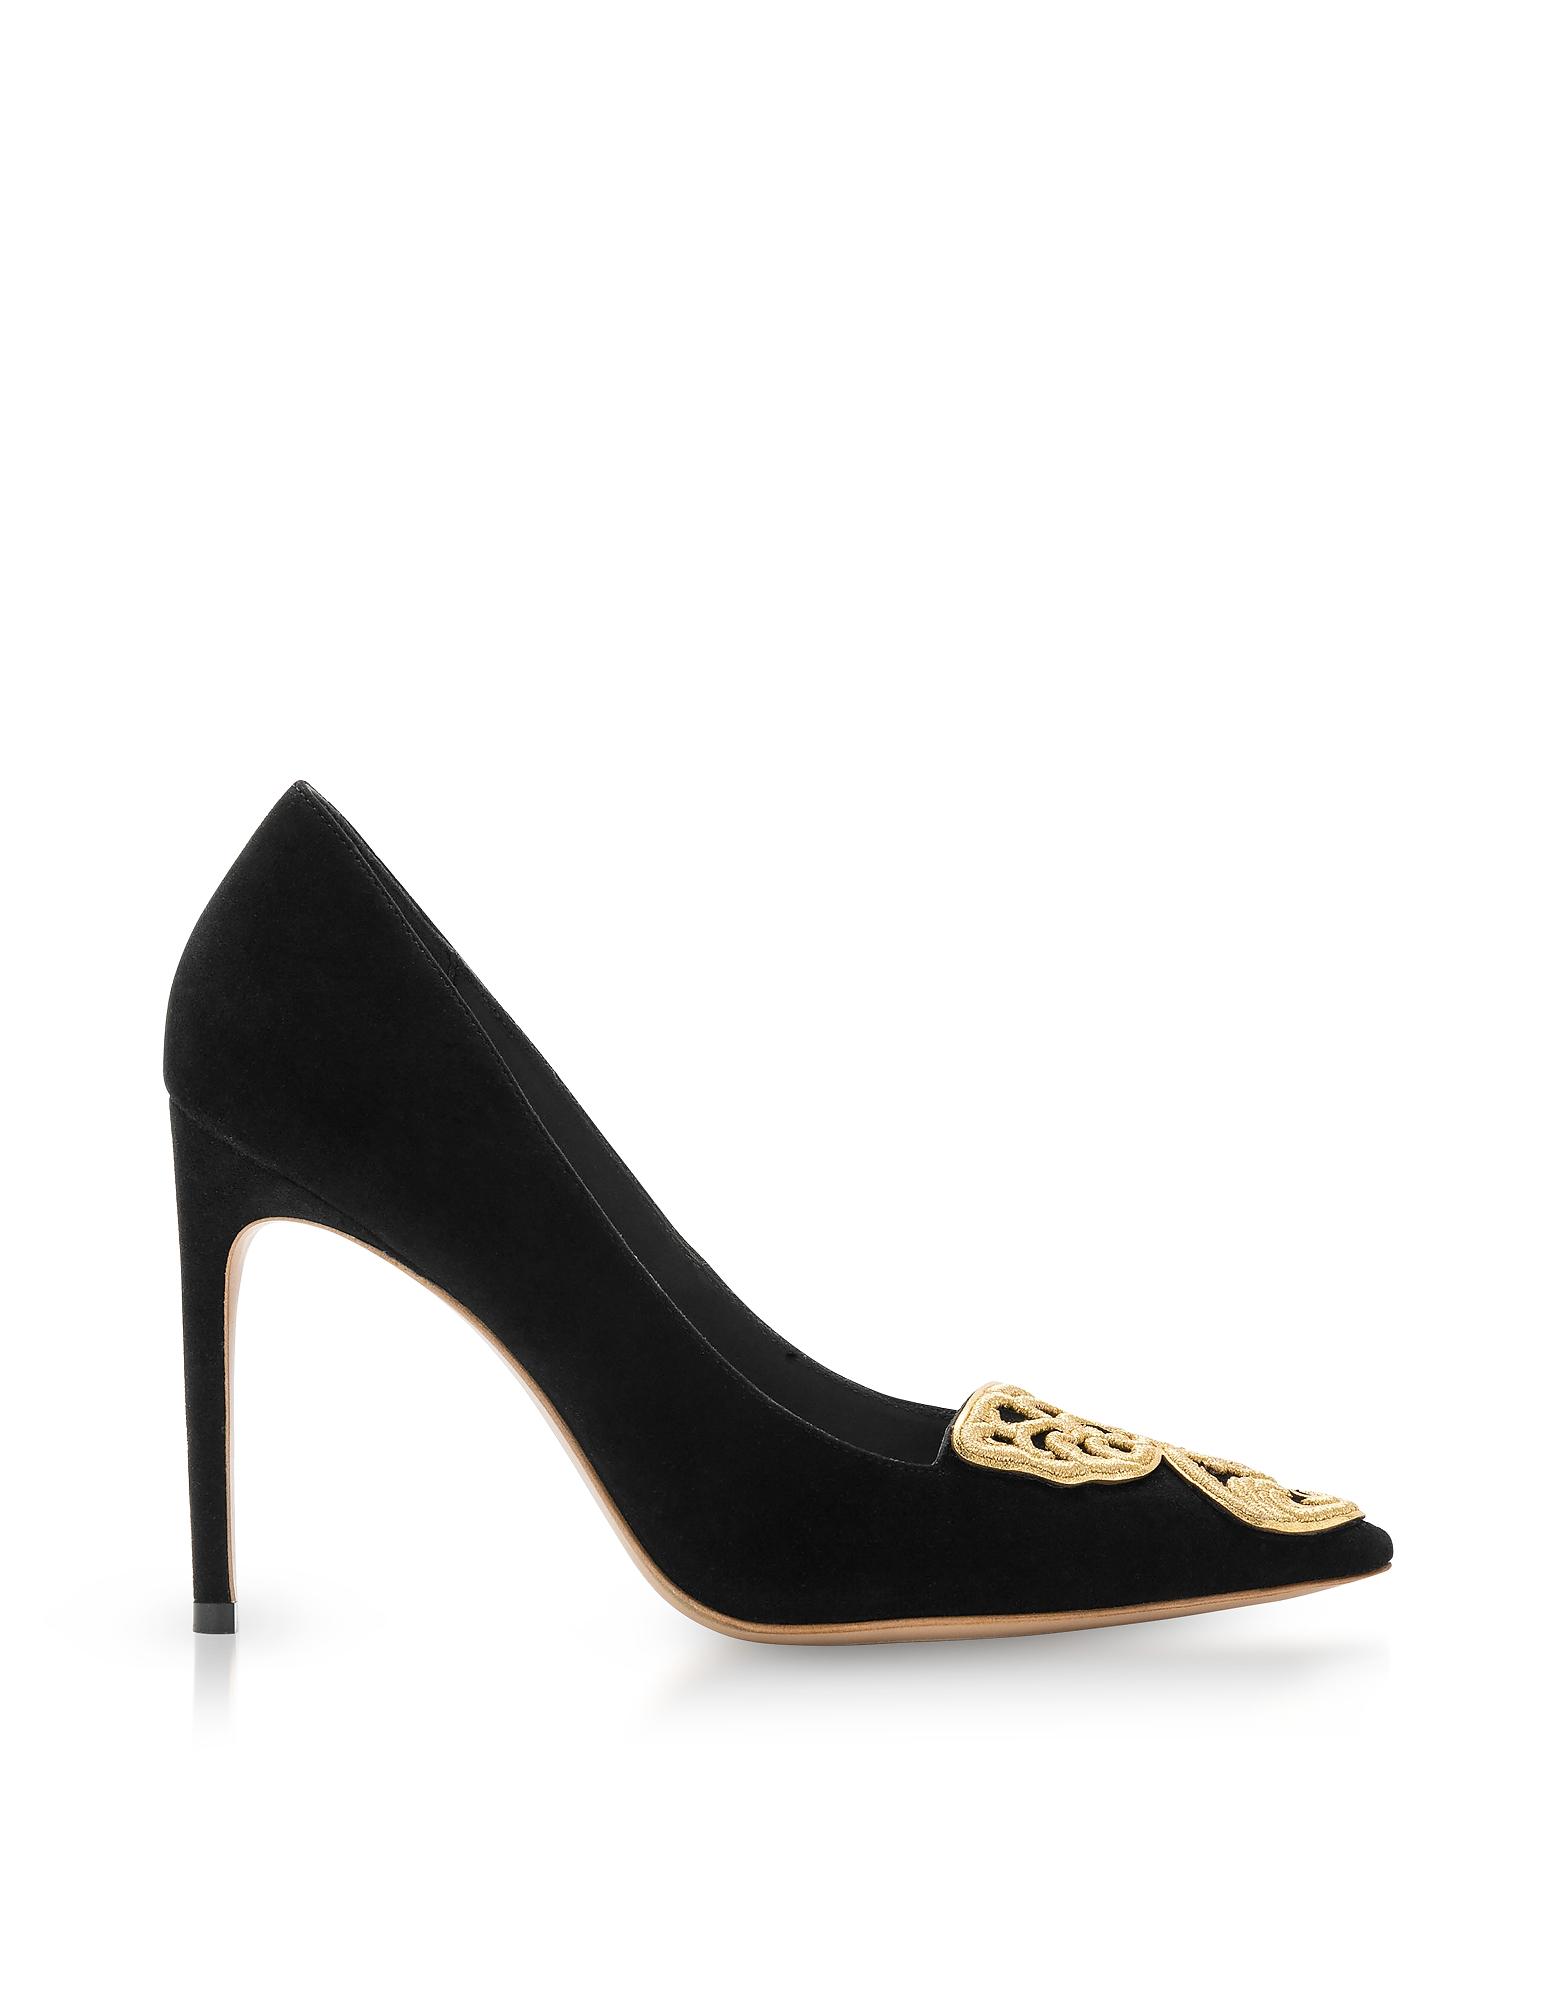 Sophia Webster Shoes, Black Suede Bibi Butterfly Rivera Pump